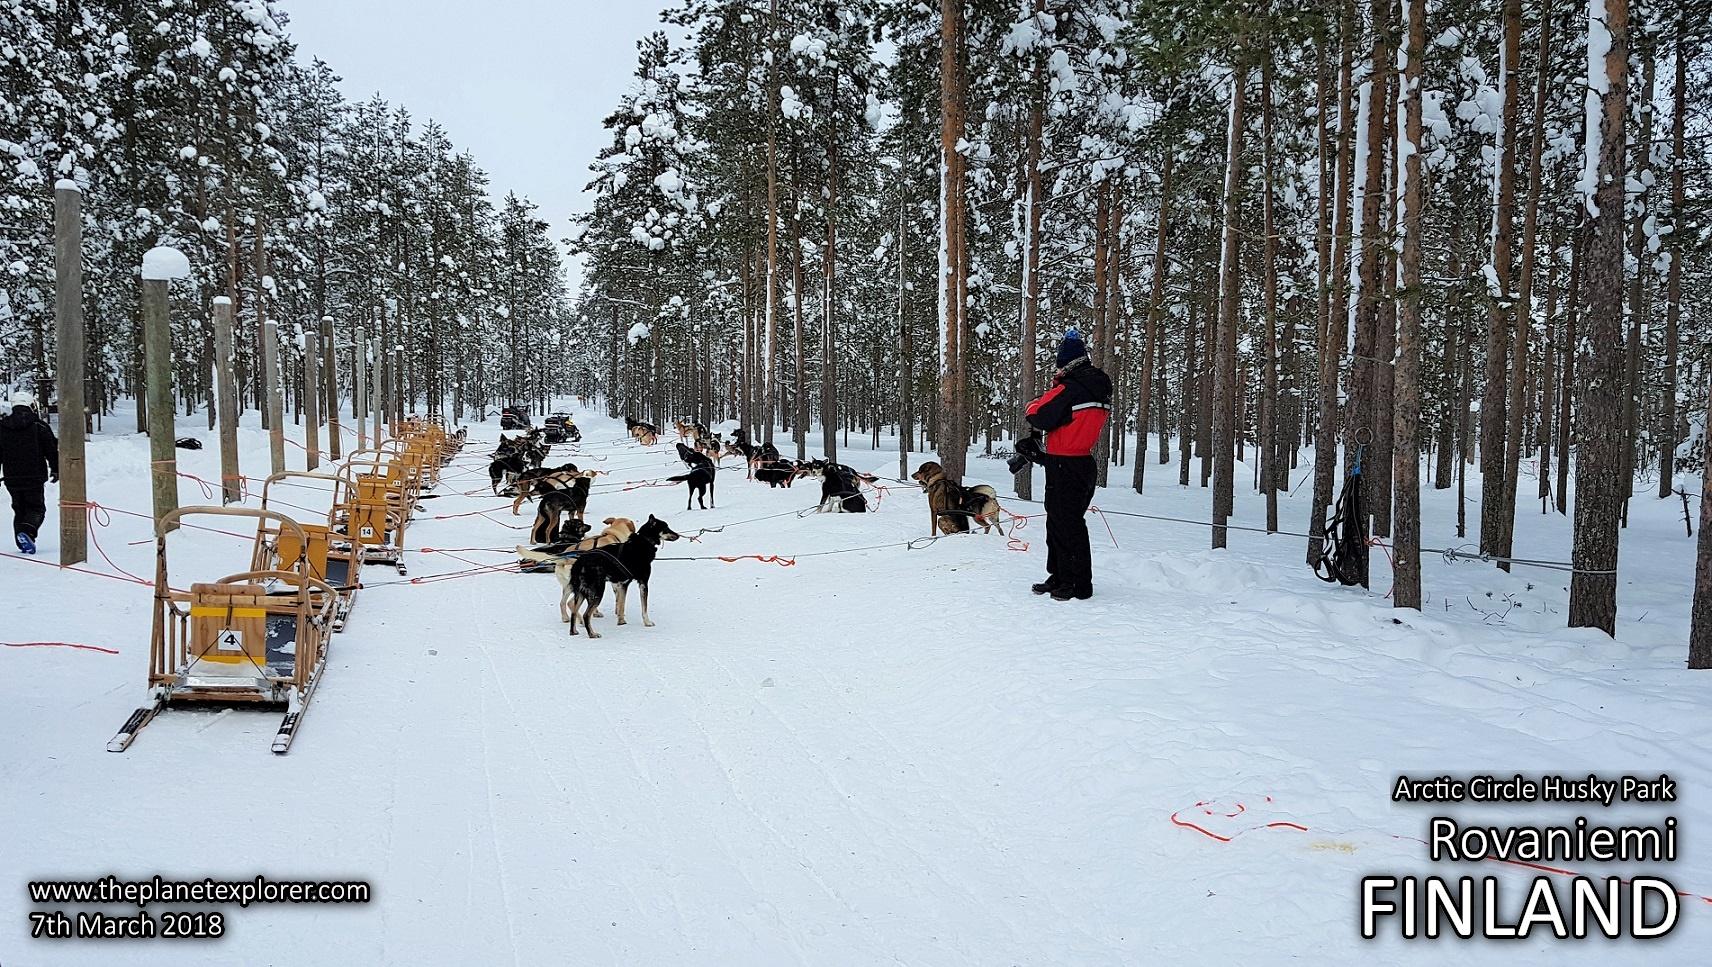 20180307_1305_Finland_Rovaniemi_Arctic Circle Husky Park_Samsung Note 8_LR_@www